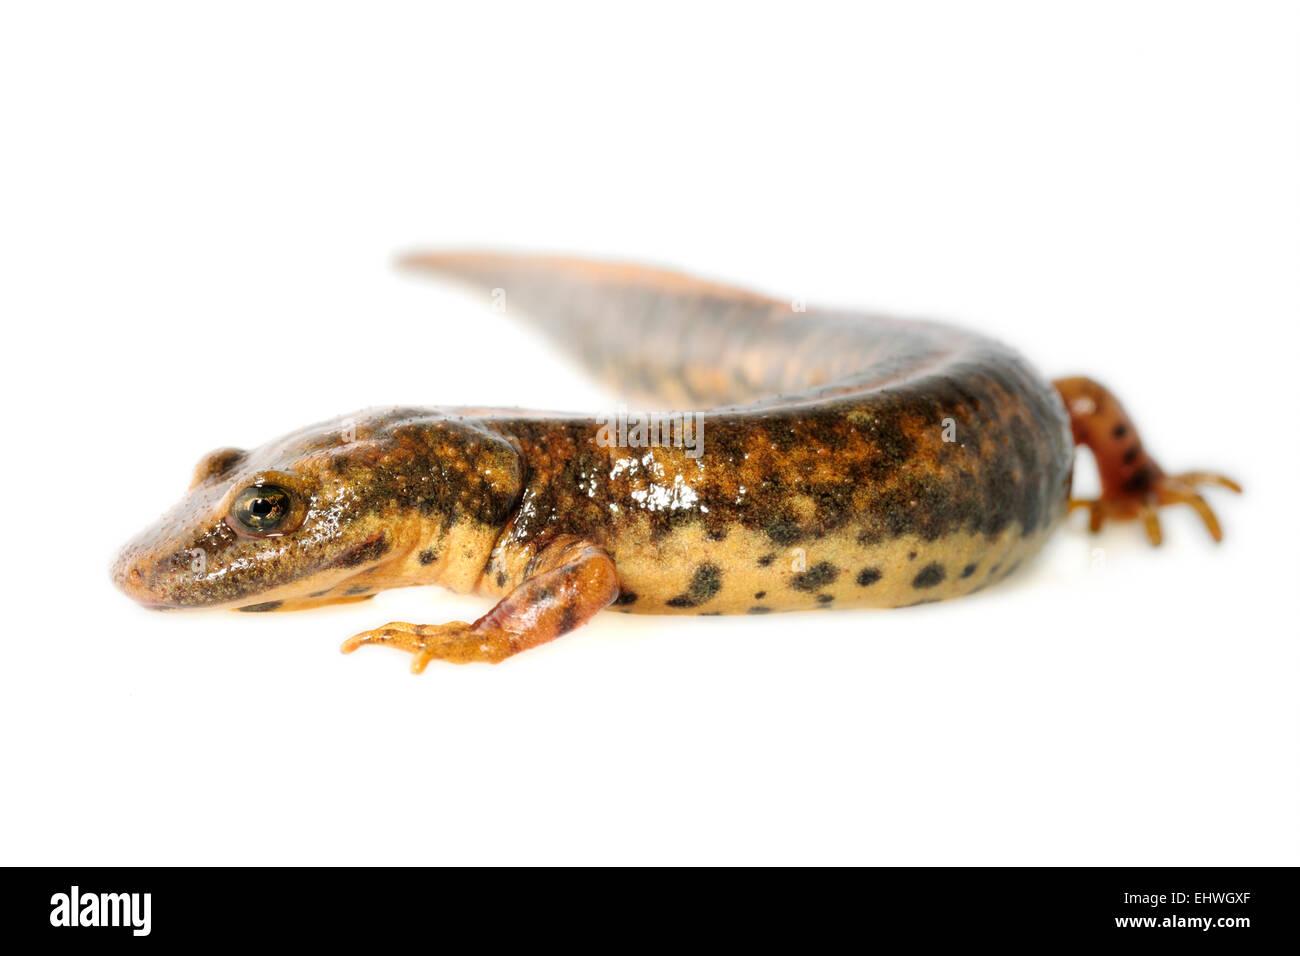 [captive] Sardinian brook salamander or Sardinian mountain newt (Euproctus platycephalus) , Sardinia, Italy | Der - Stock Image